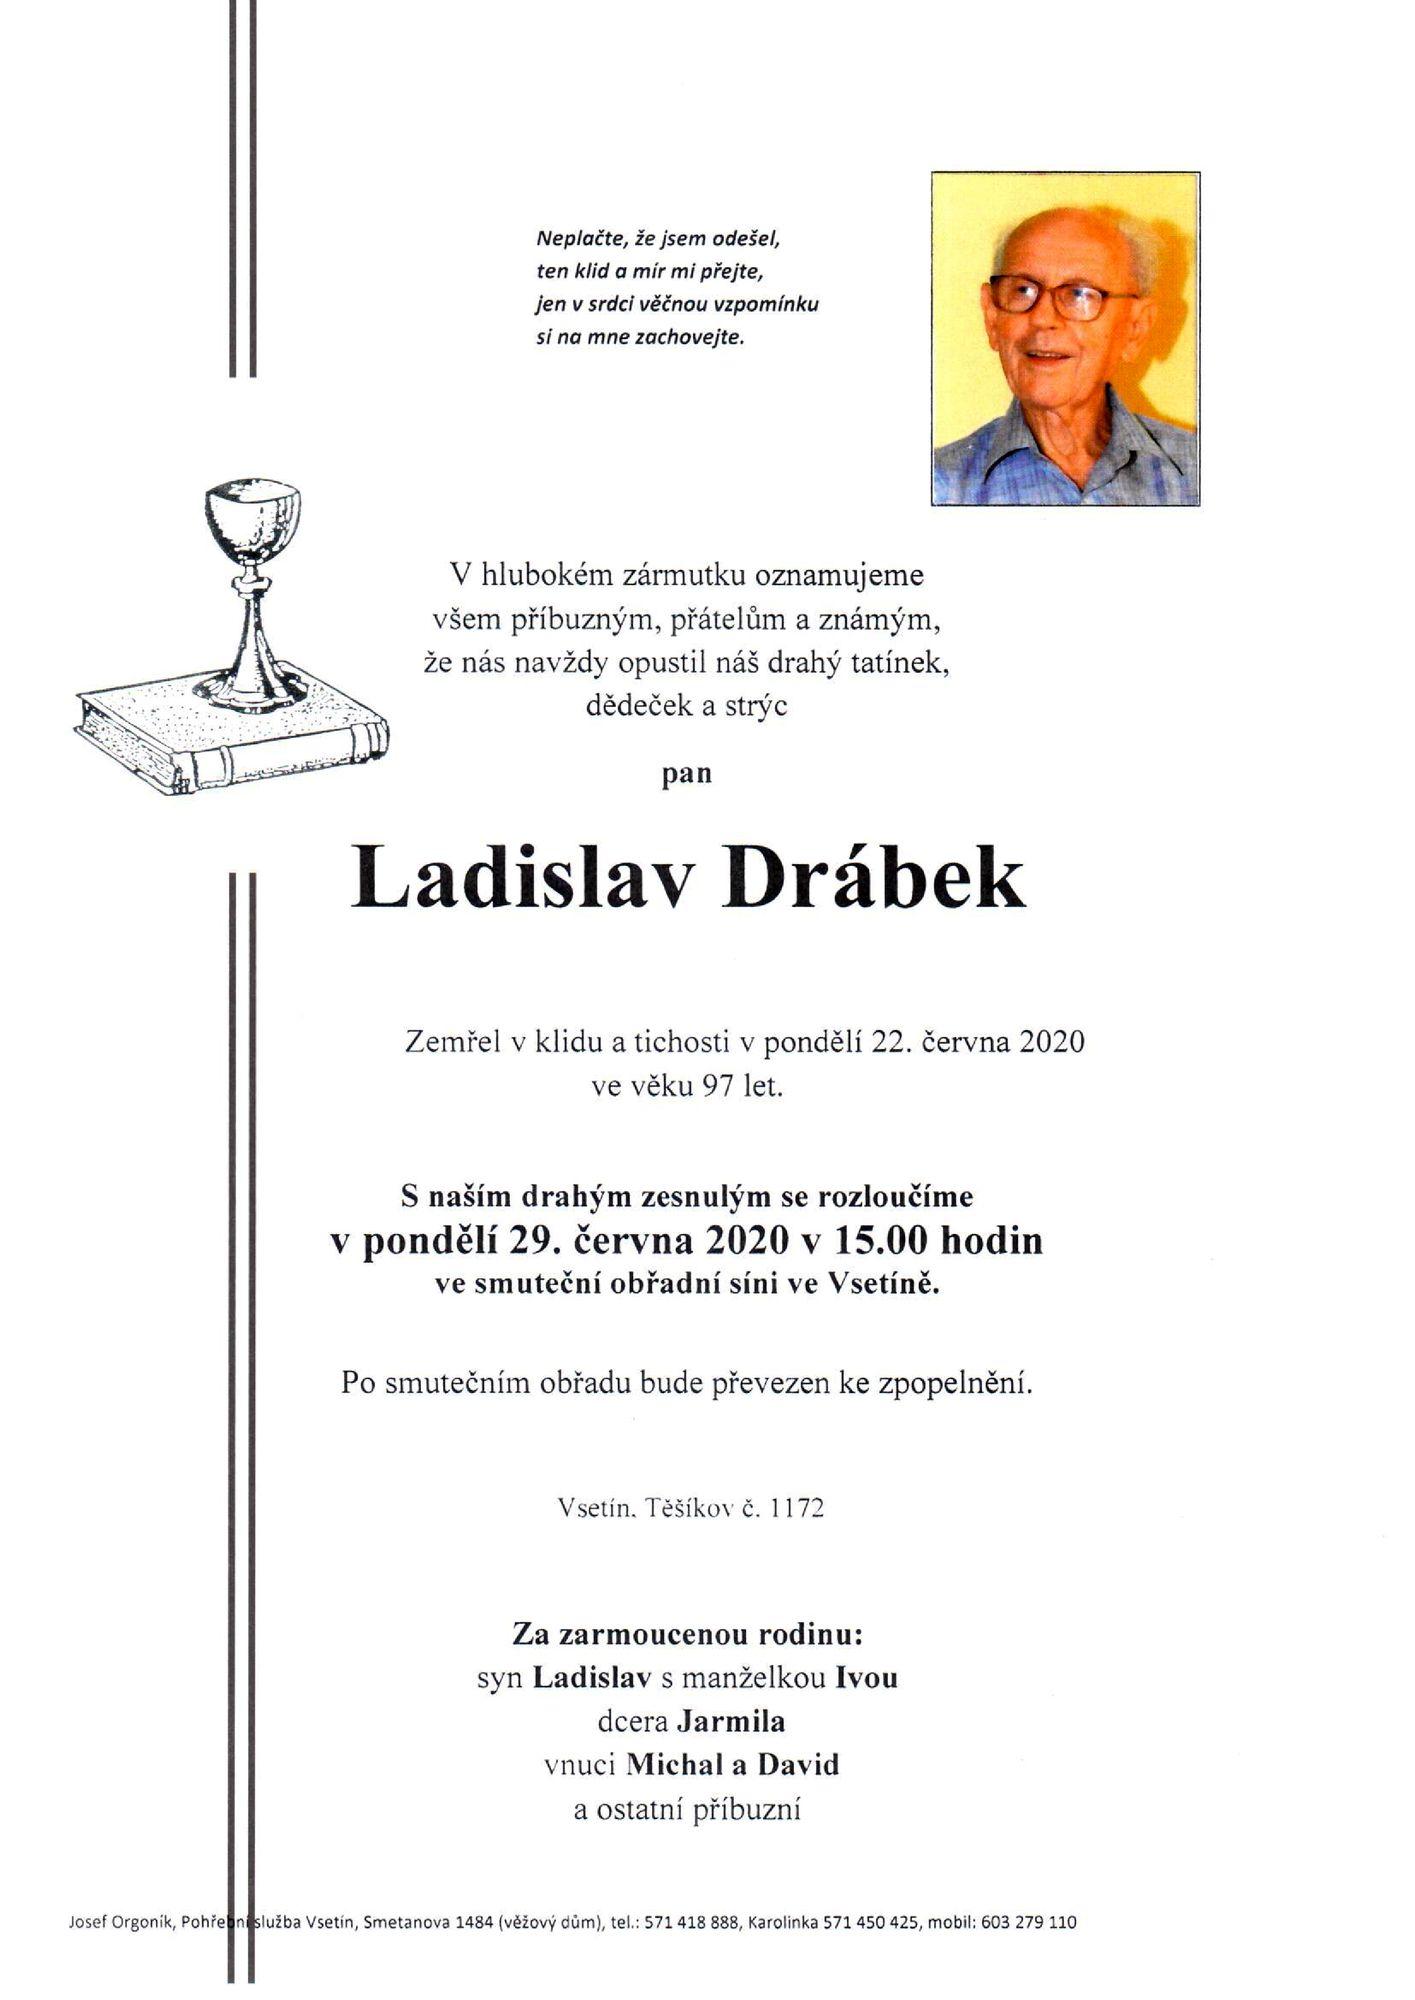 Ladislav Drábek